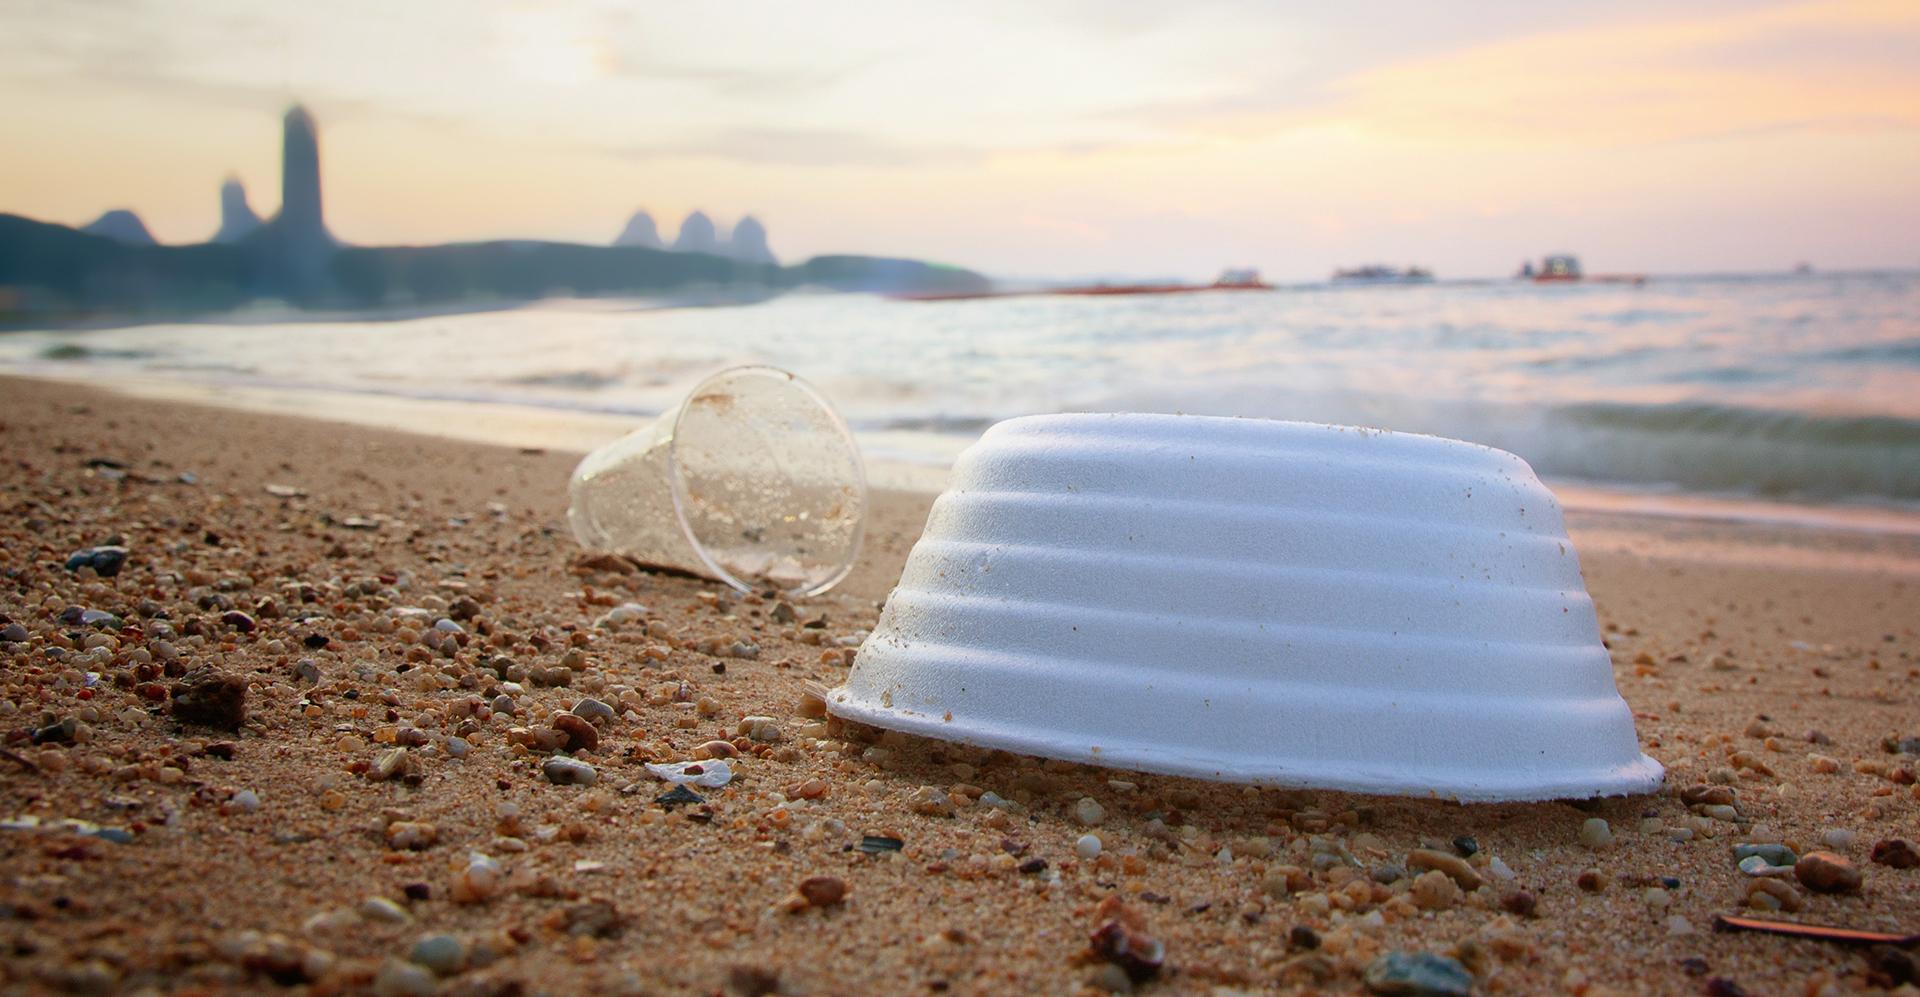 Baltimore Bans Styrofoam While Annapolis Says No